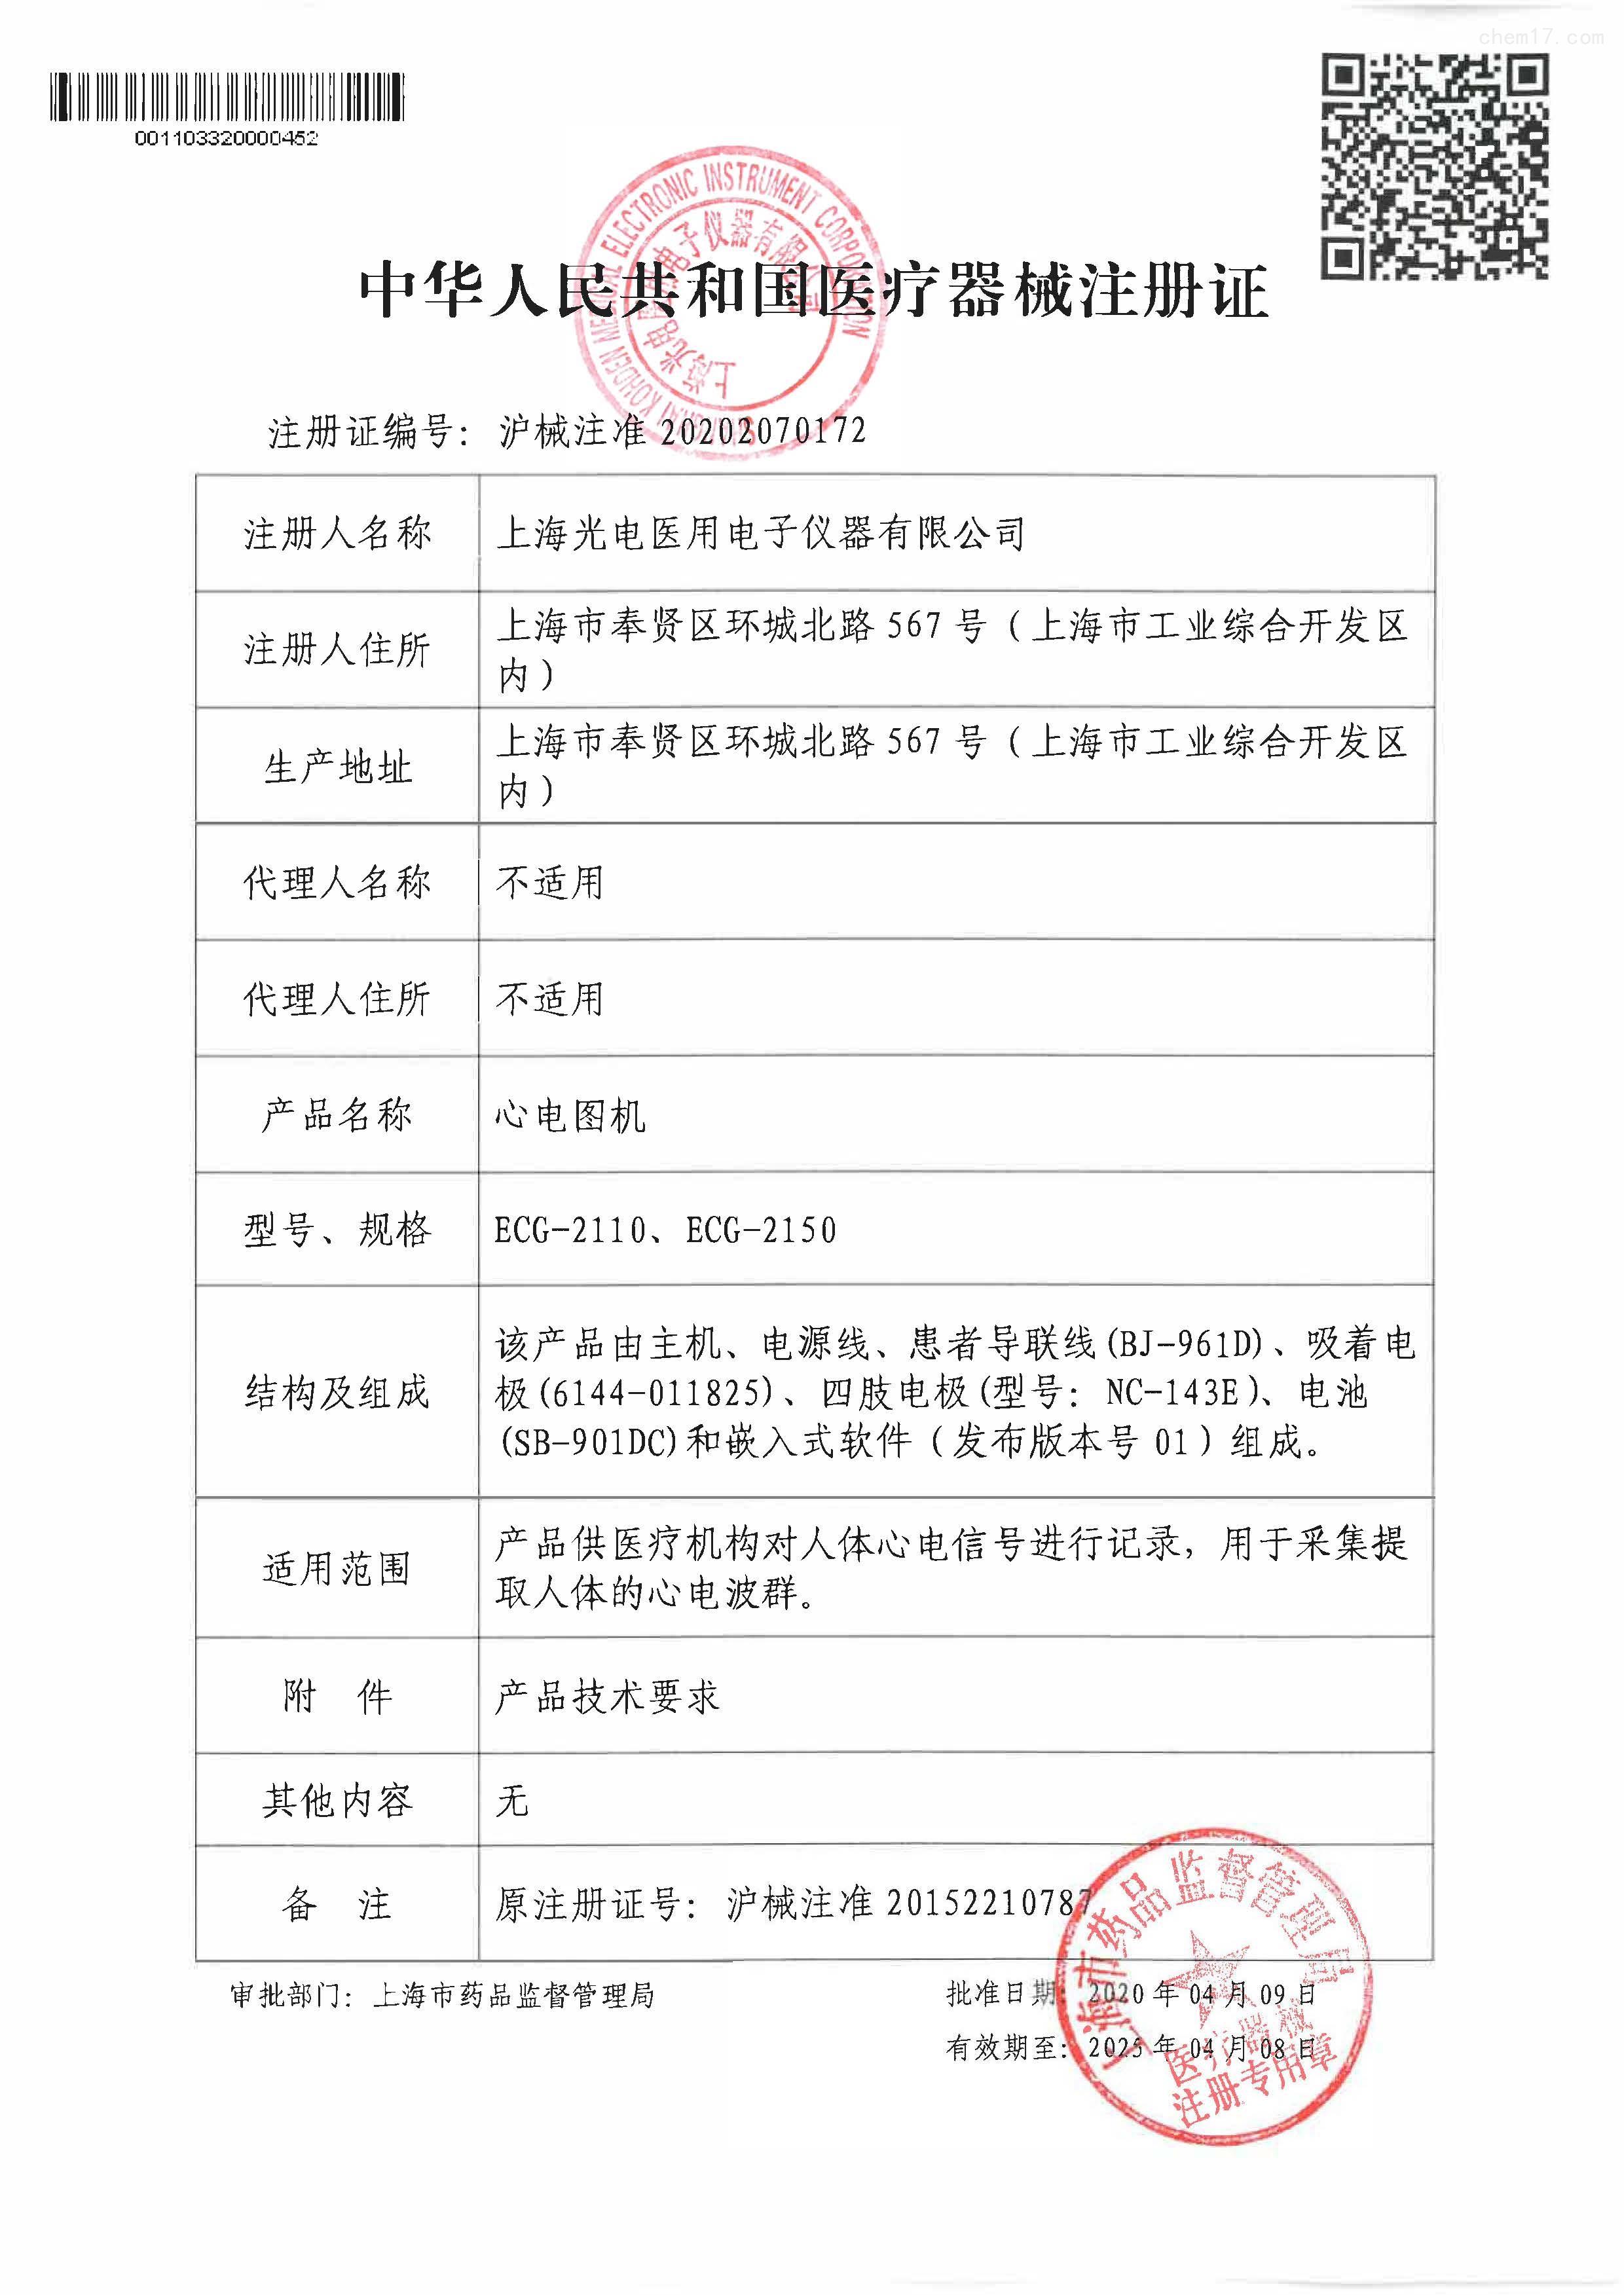 ECG-2110、ECG-2150型注册证.jpg